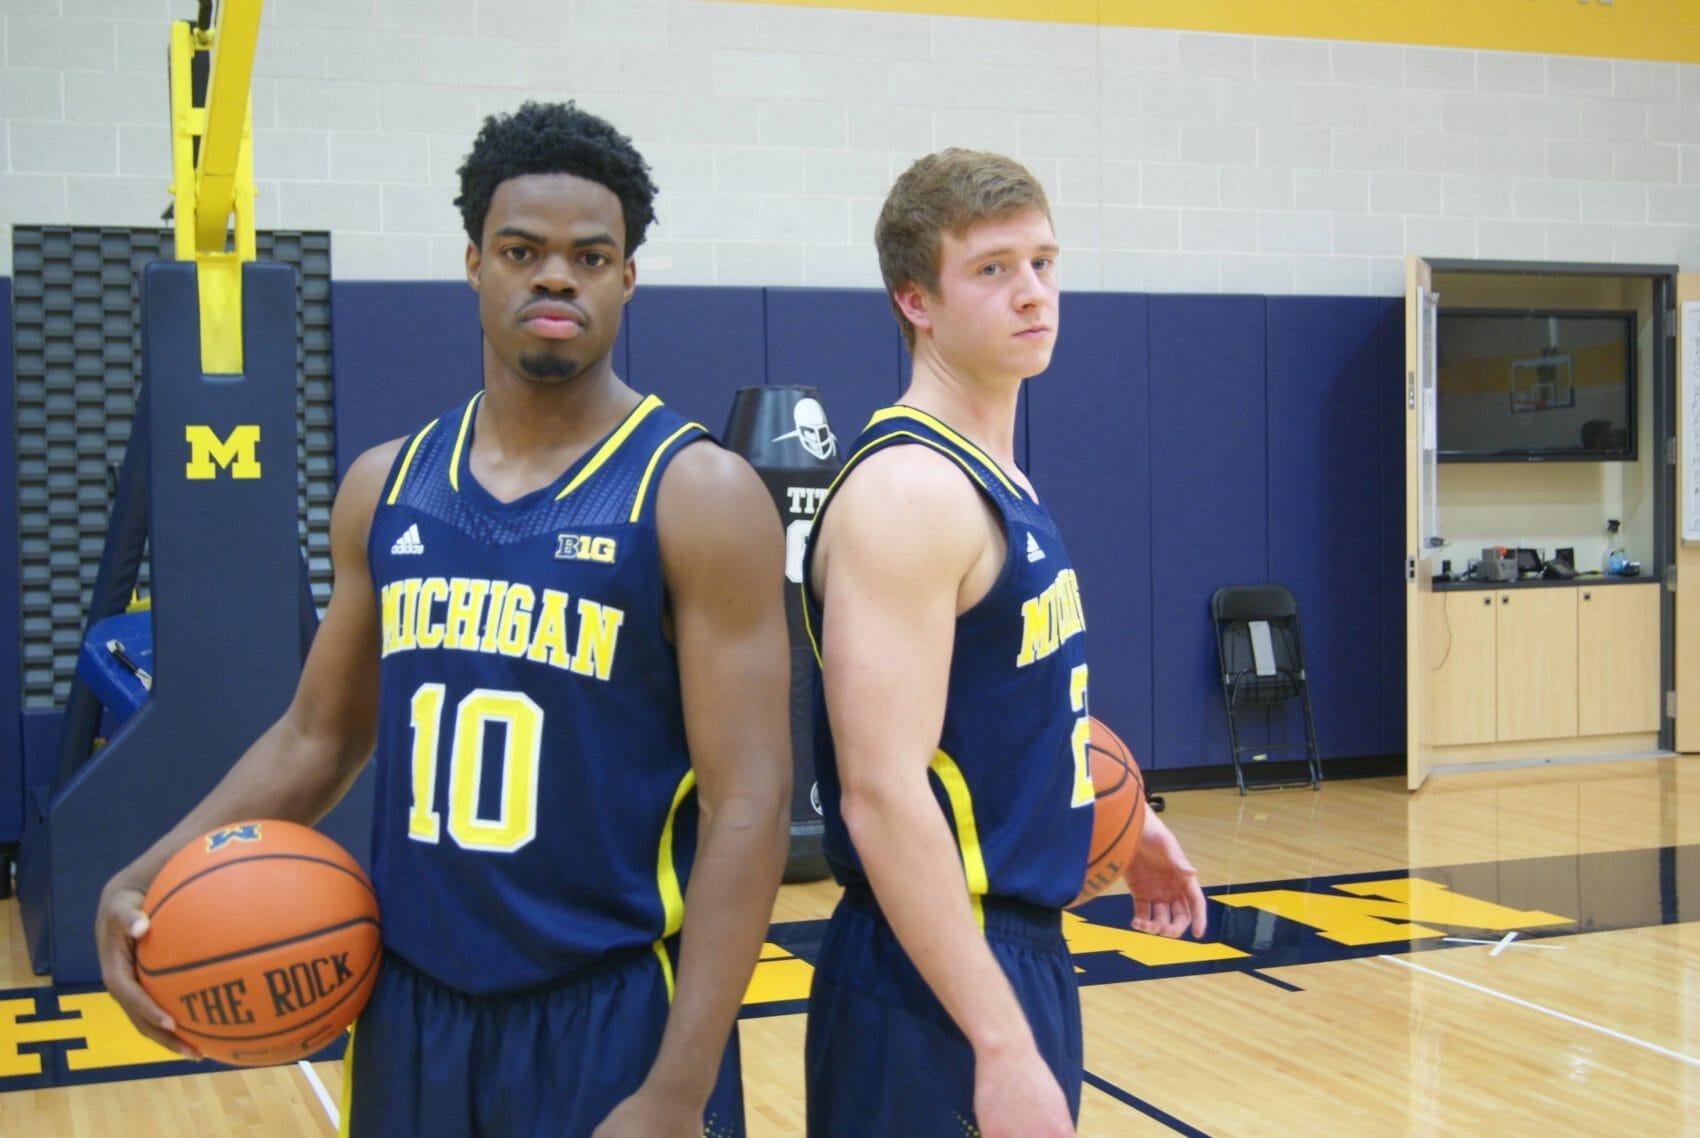 Michigan Basketball Media Day 2014 – 6